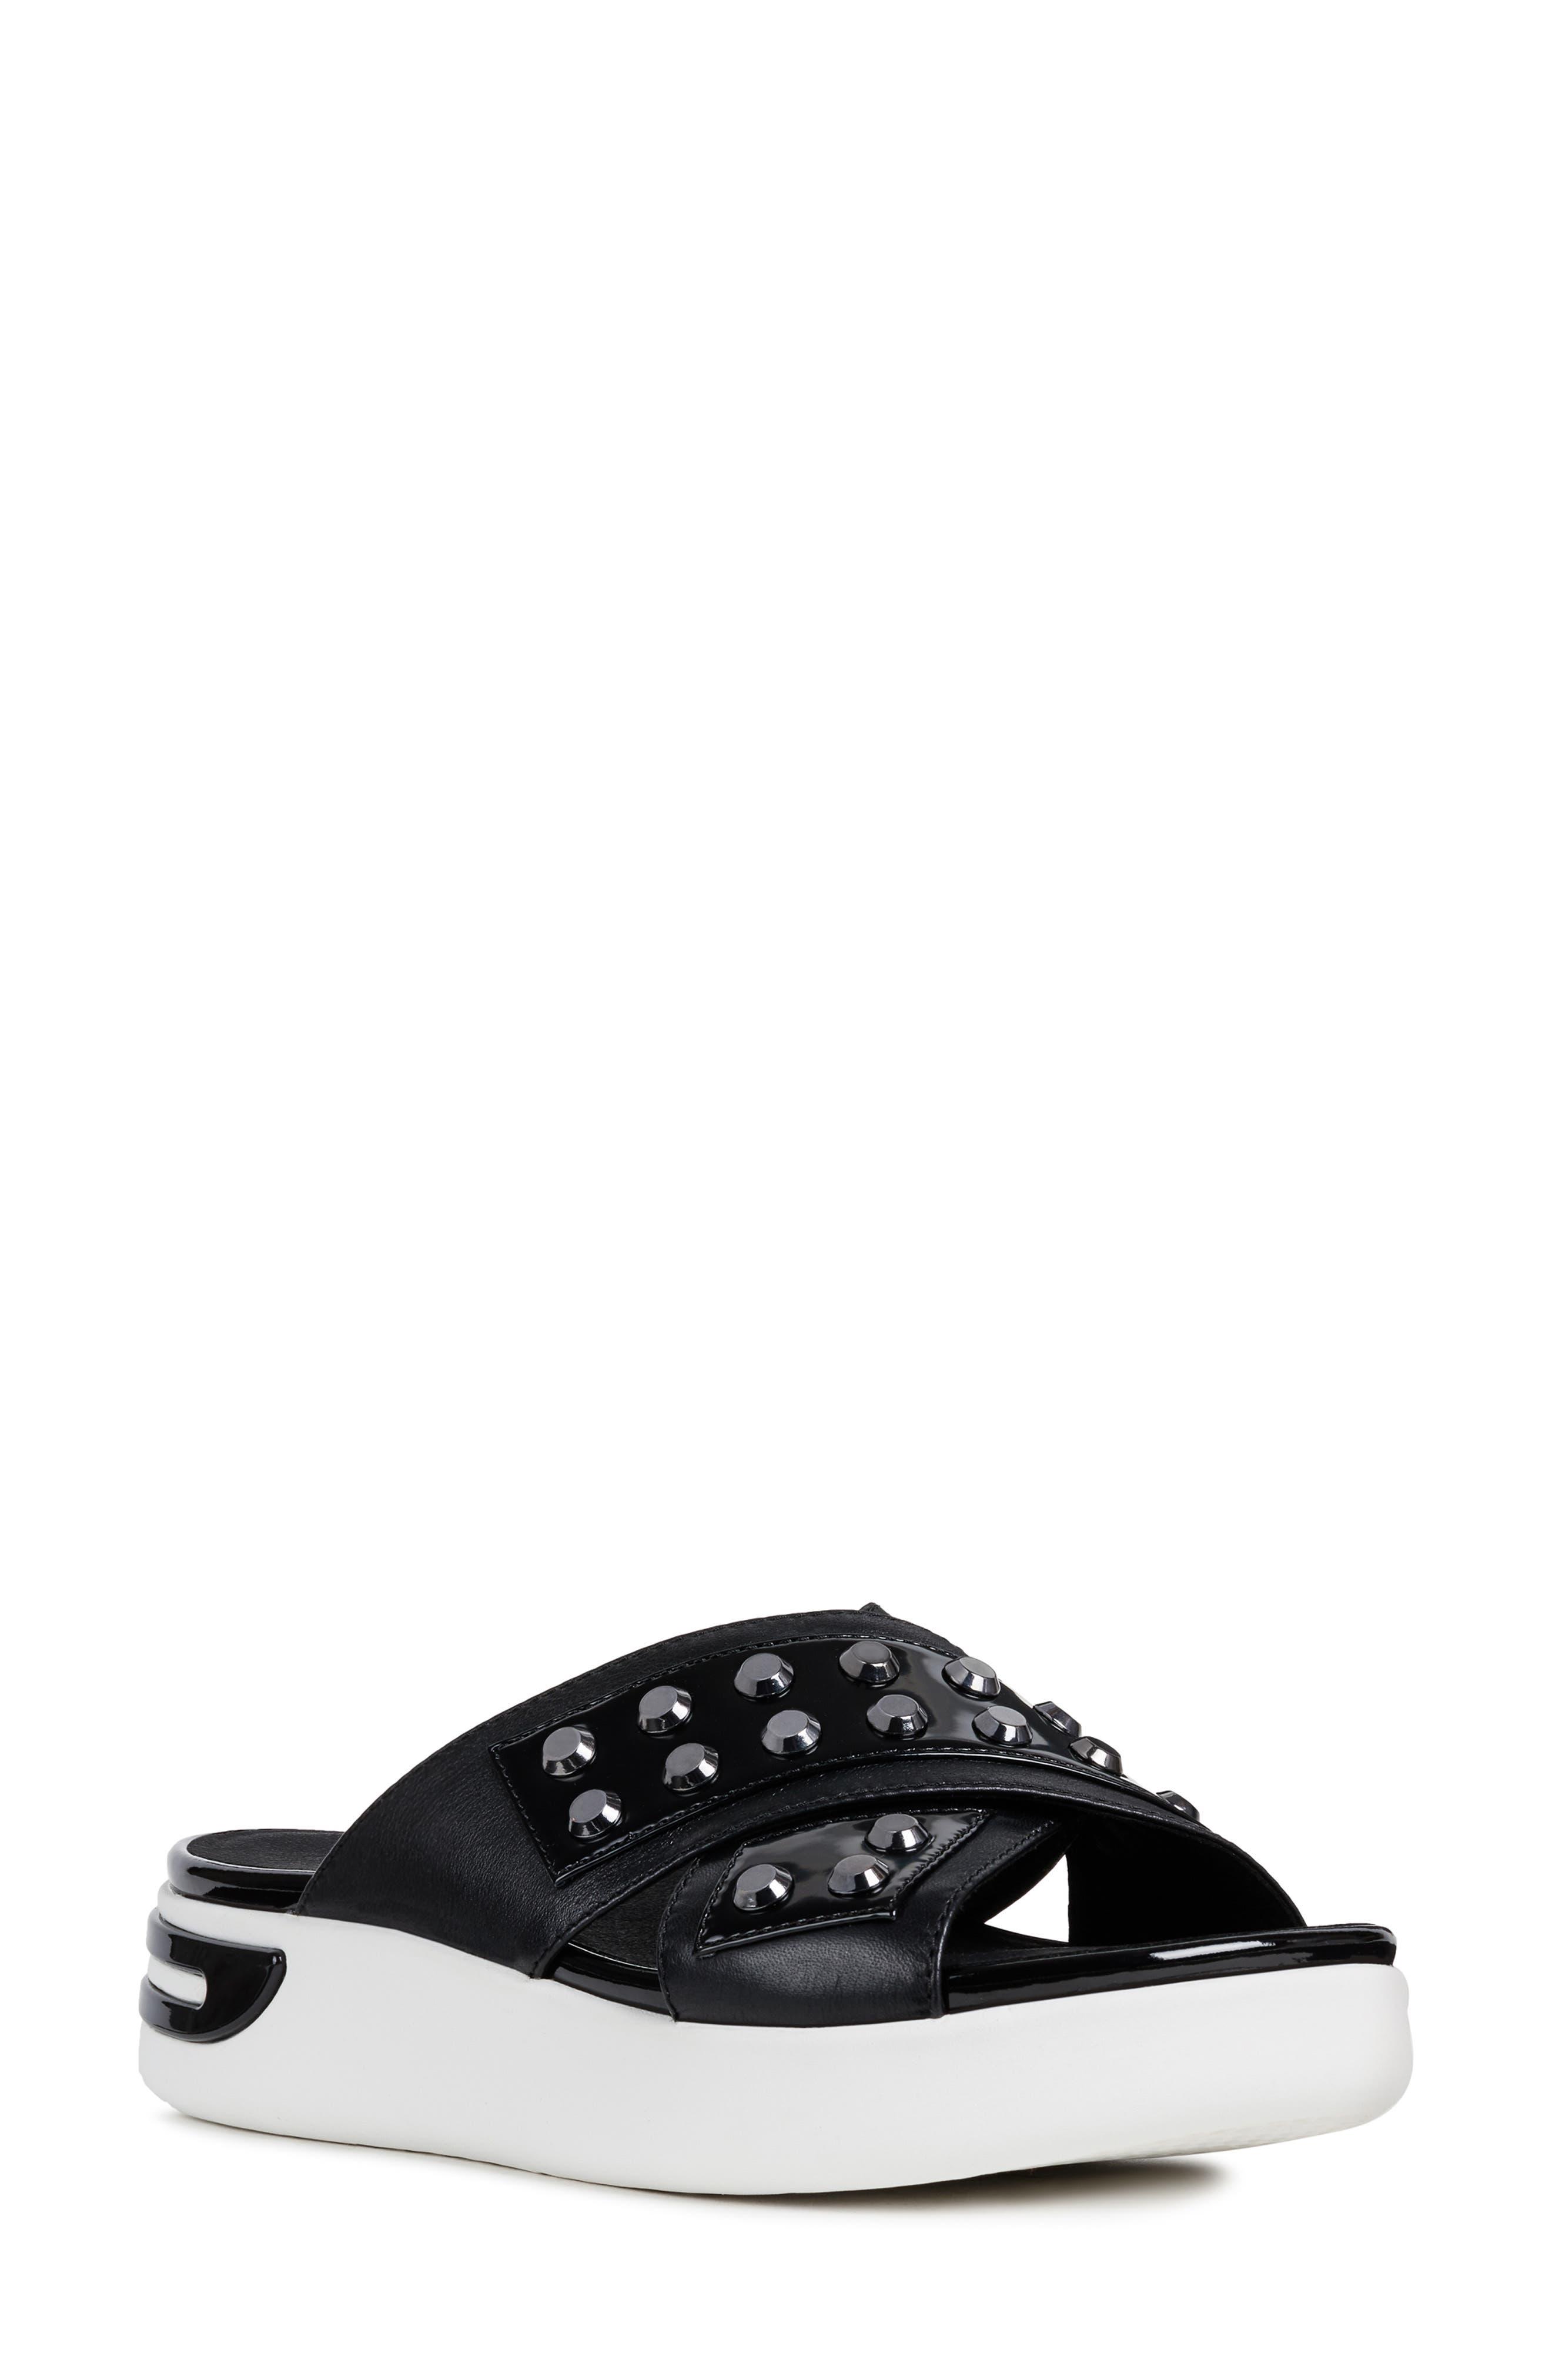 GEOX Ottaya Studded Slide Sandal, Main, color, BLACK LEATHER